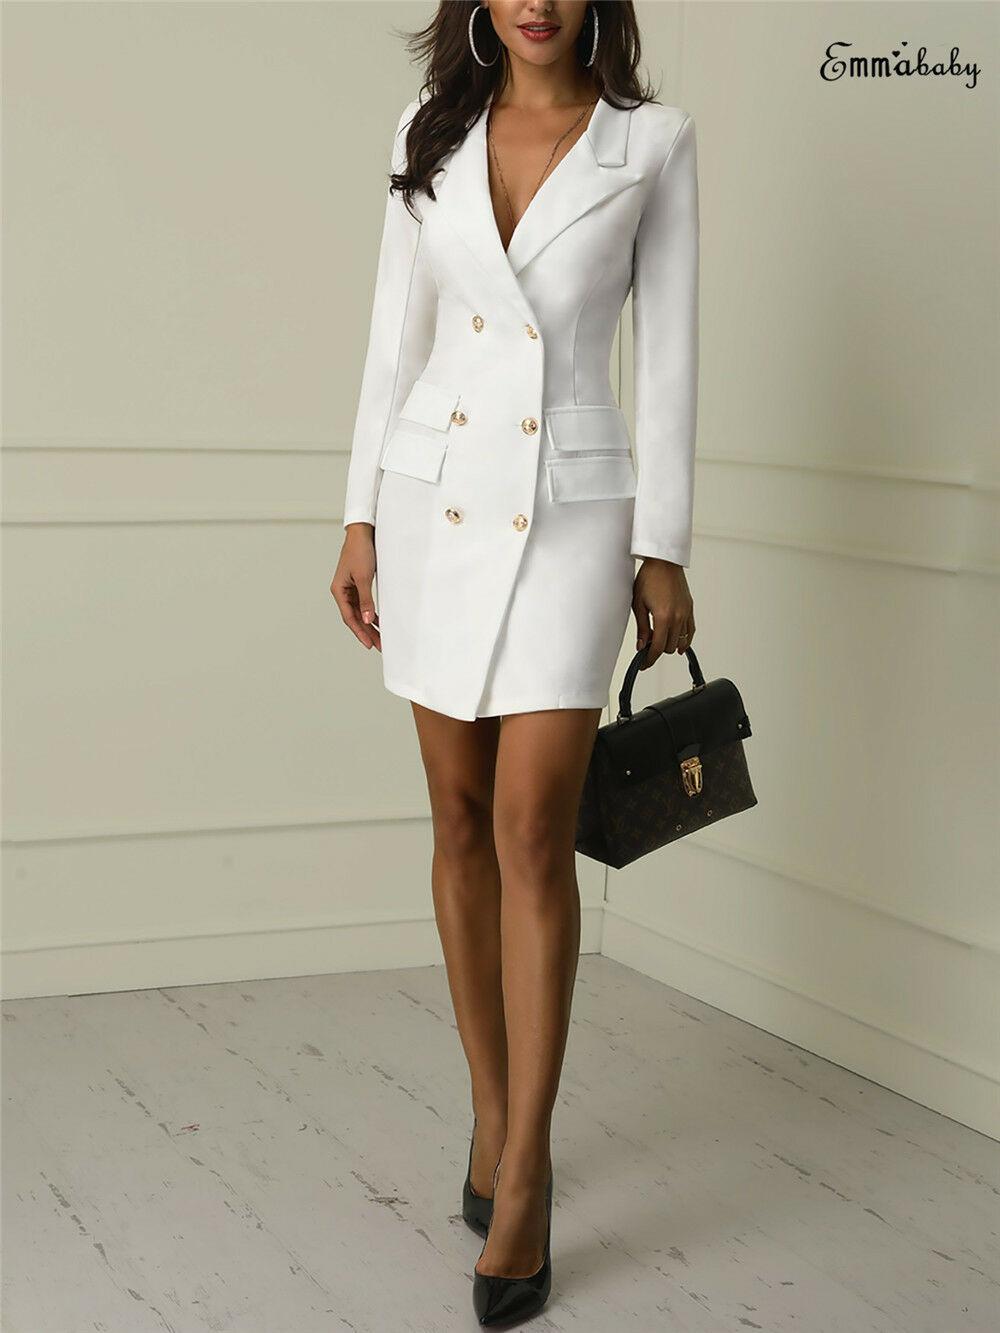 Hot Winter Women's Slim Warm   Coat   Jacket Double Breasted   Coat   Wool Regular Turn   Down   Neck Outerwear